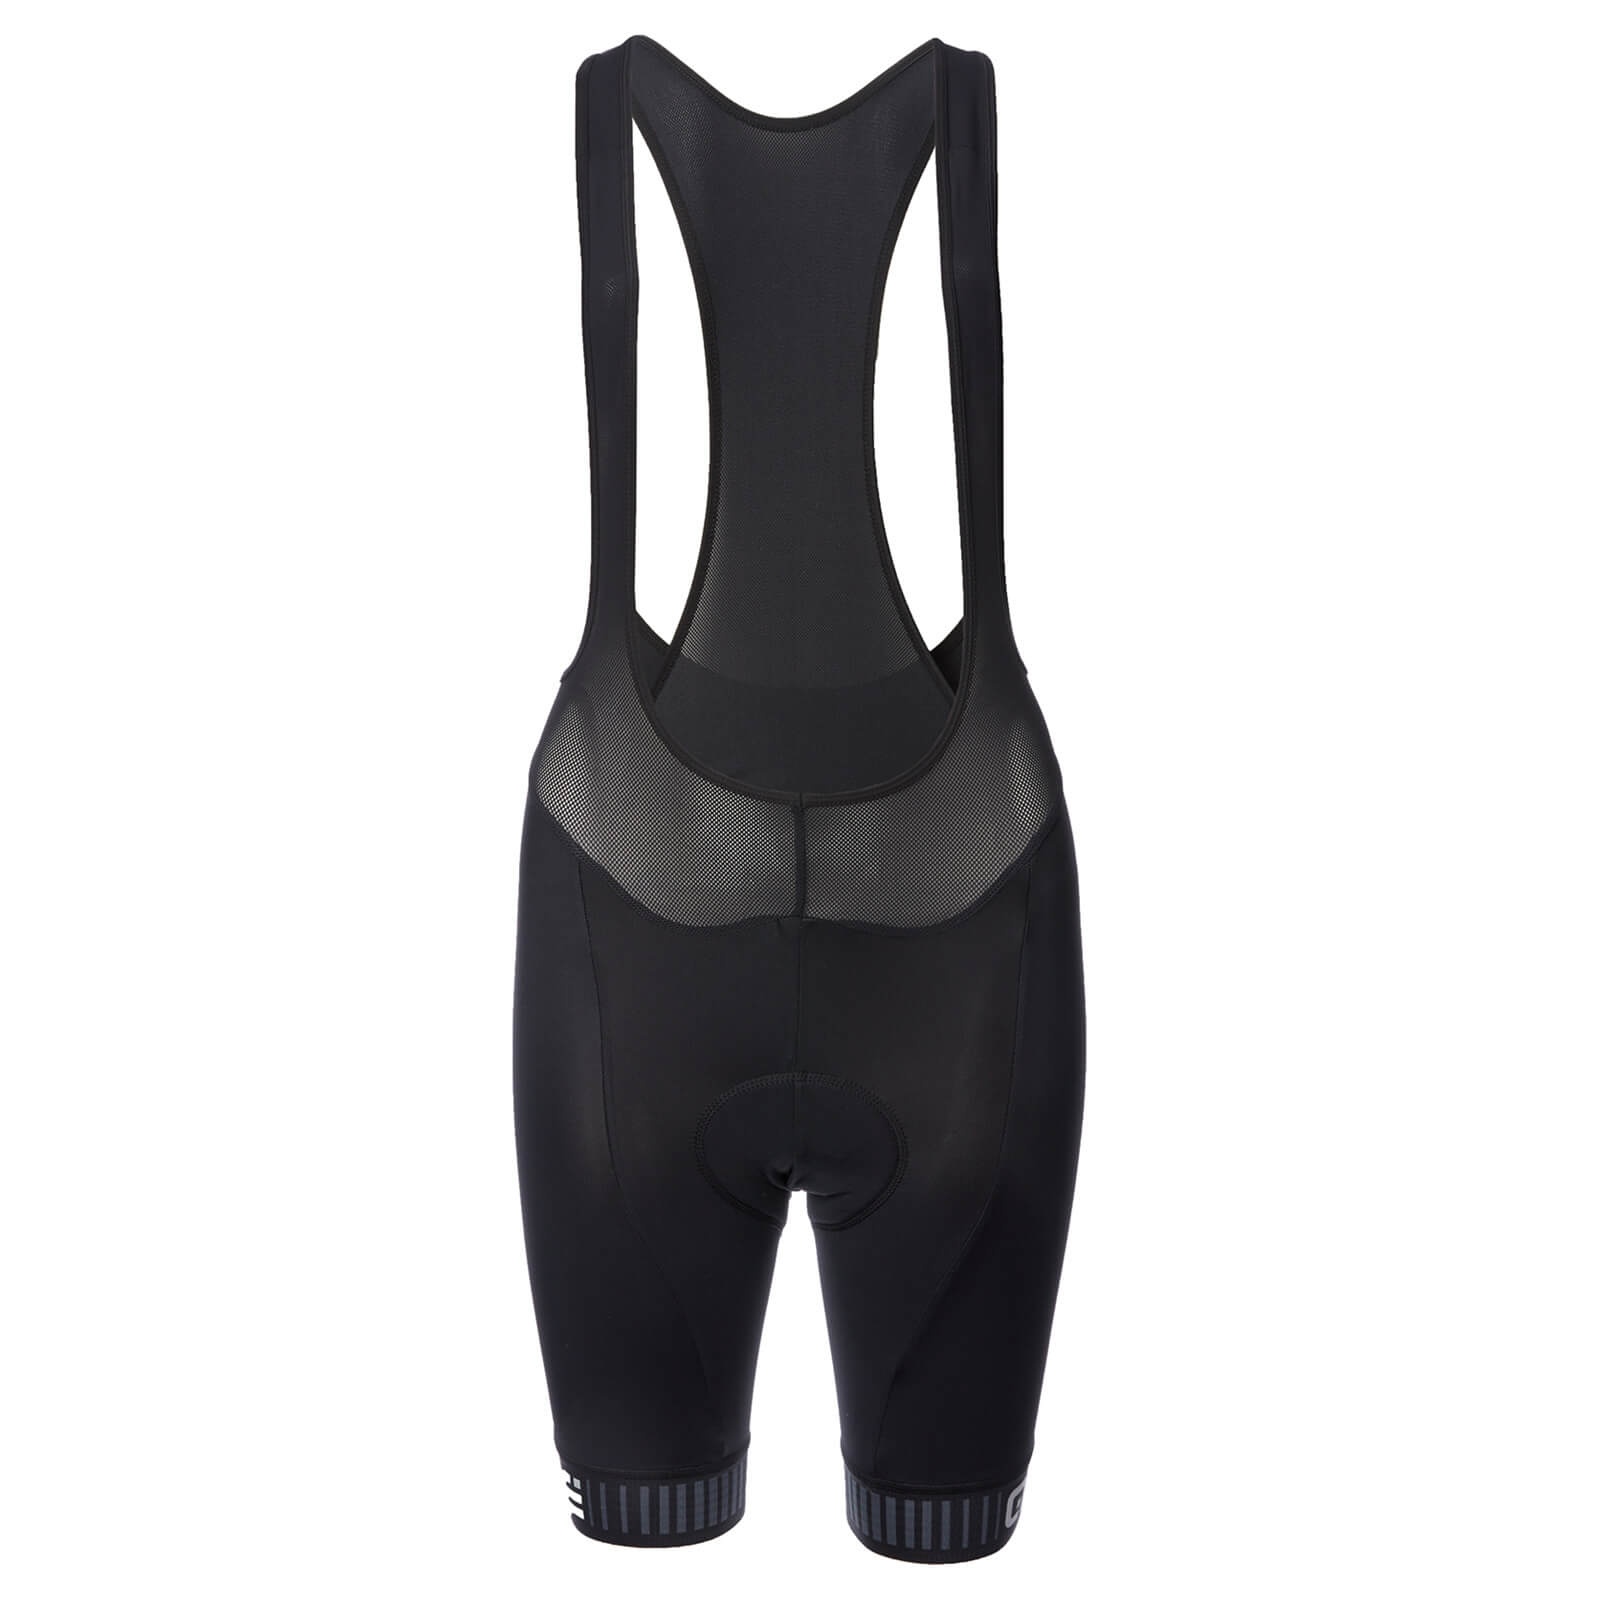 Alé Women's Solid Traguardo Bib Shorts - L - Black